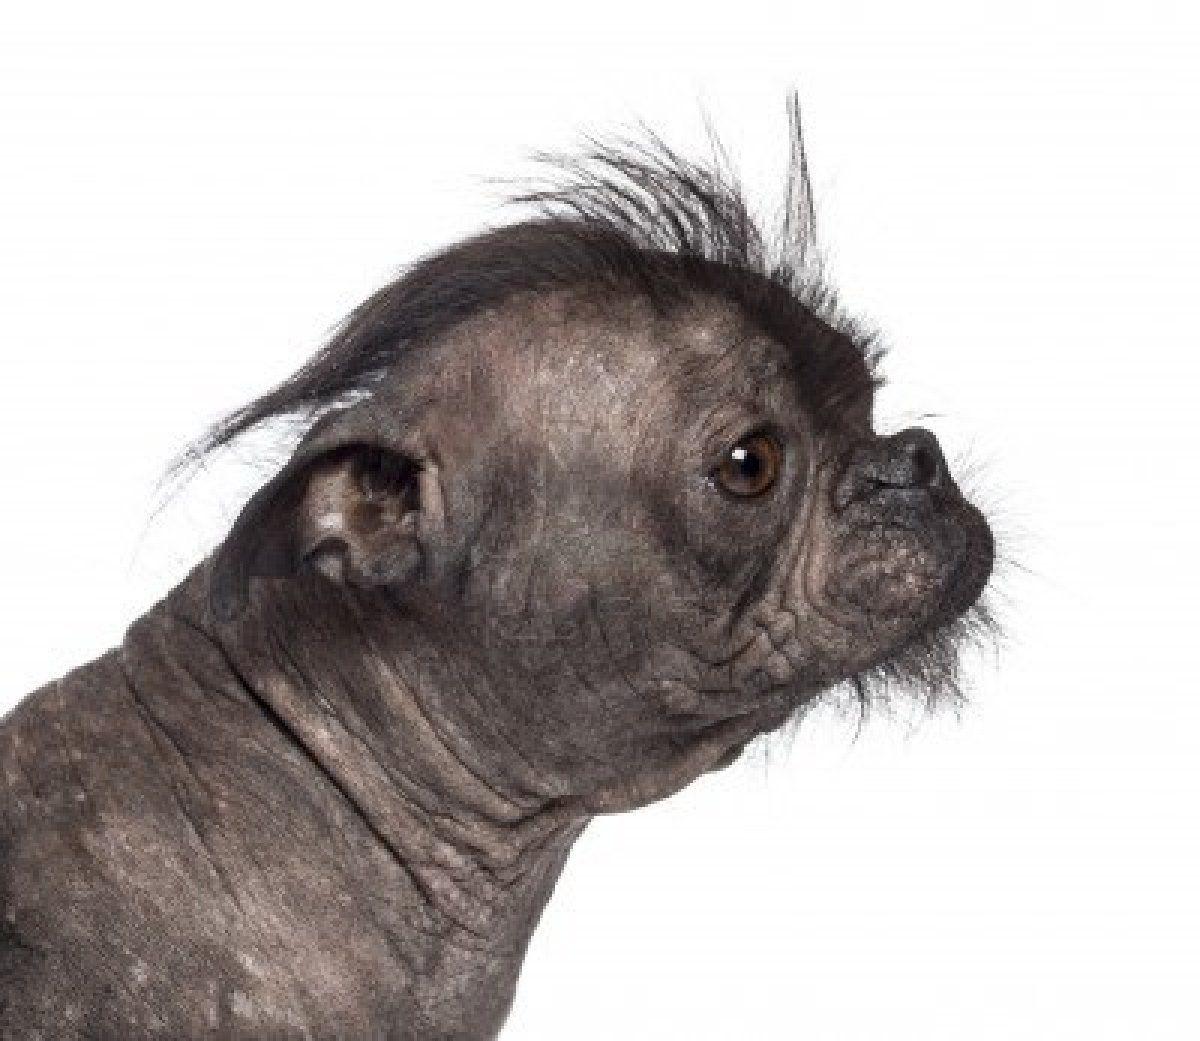 16773980 Hairless Dog Mix Between French Bulldog And Chinese